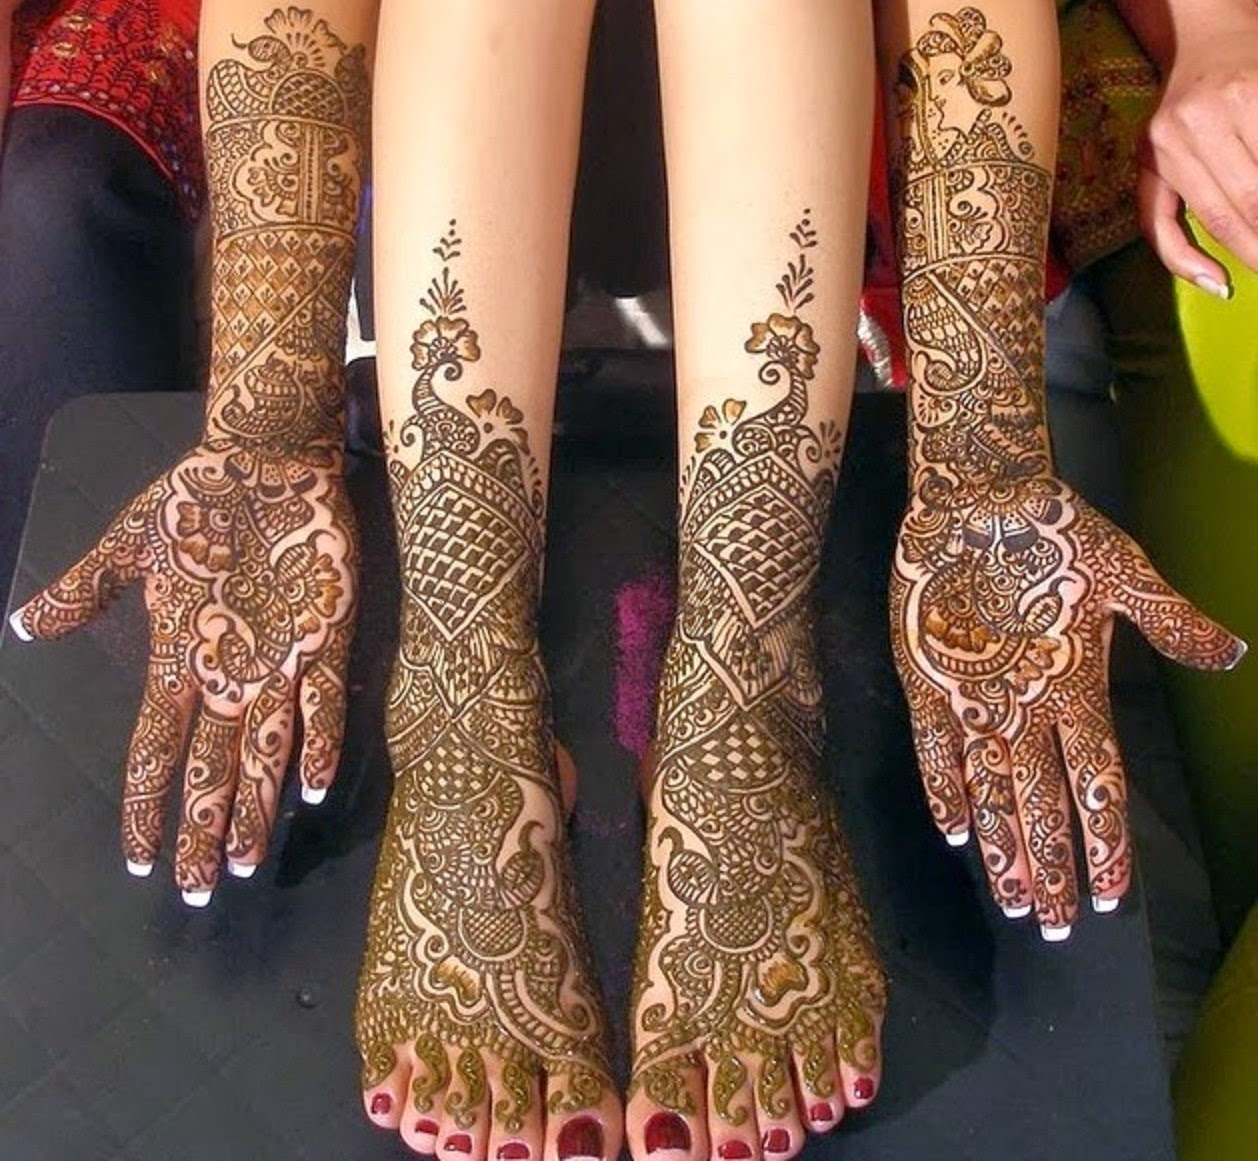 Bridal Hands With Mehndi : Bridal mehndi designs new feet and hand